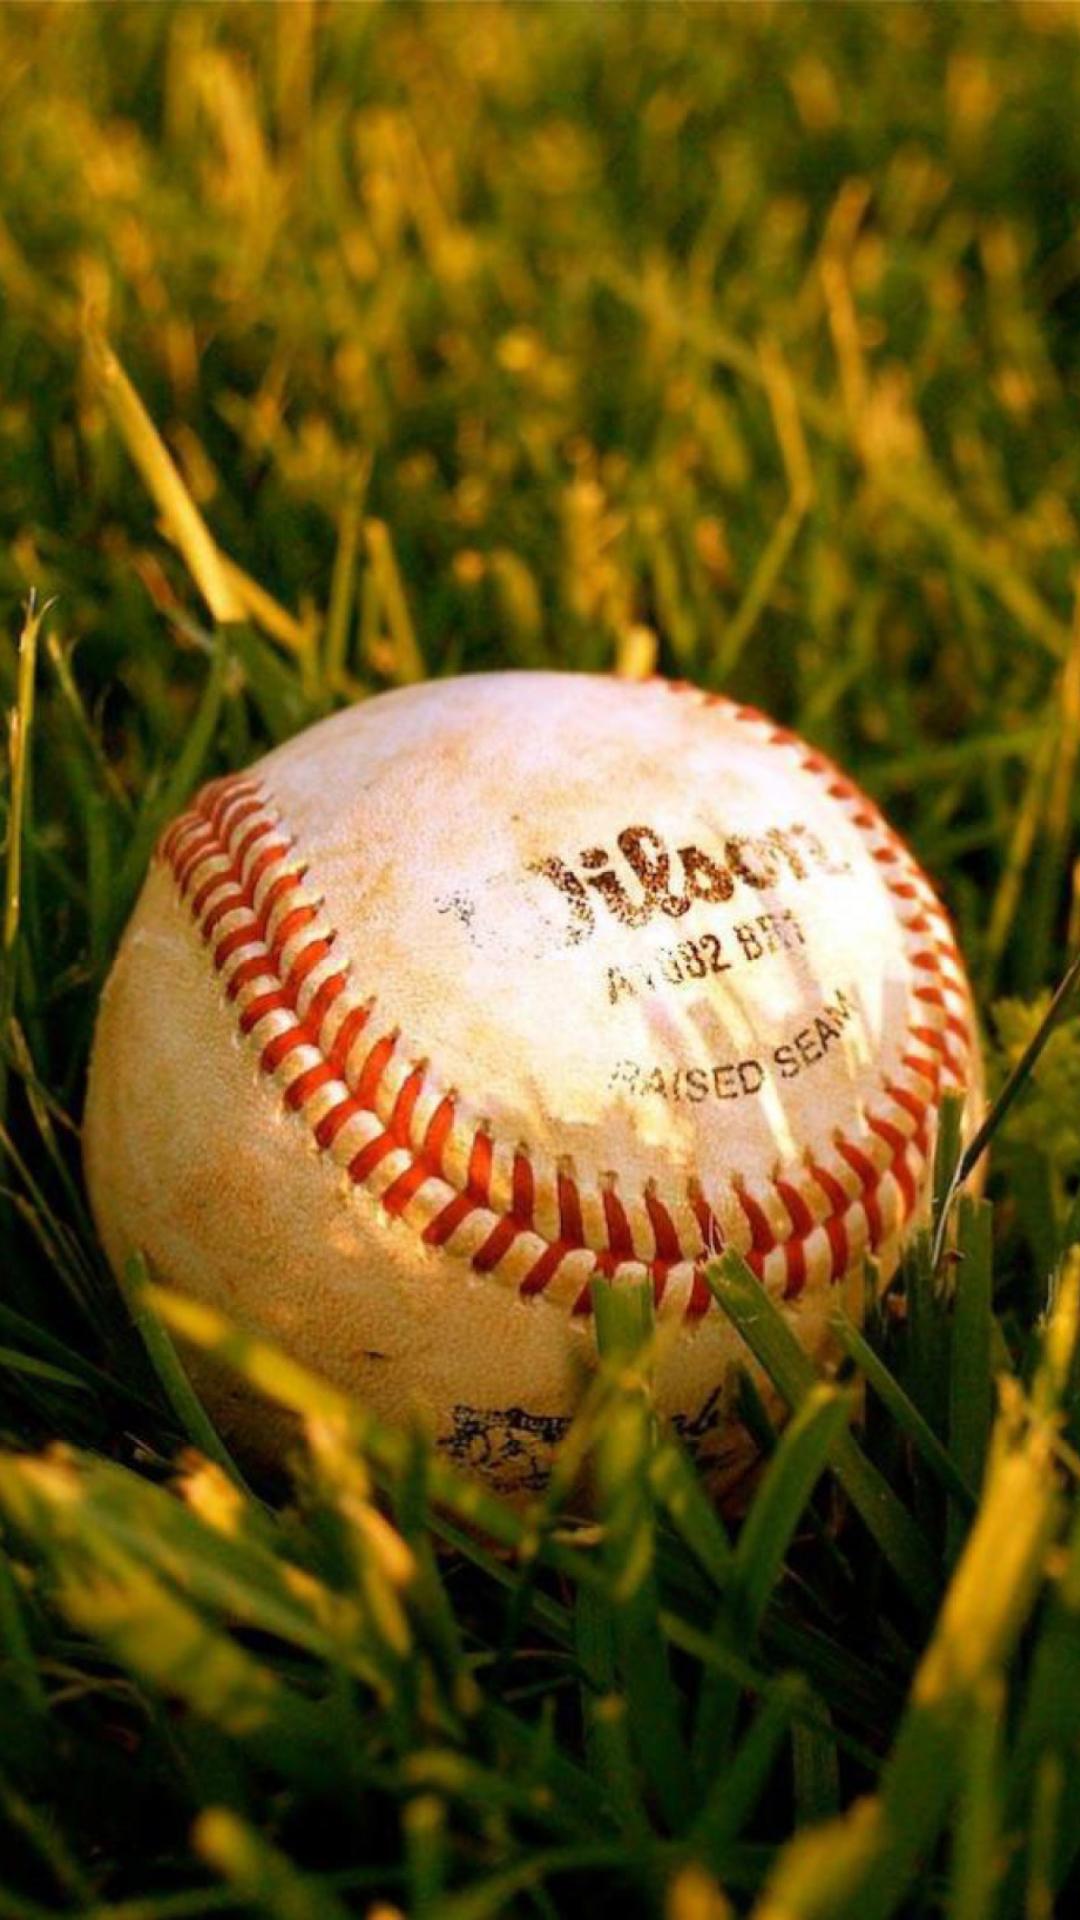 Baseball Wallpaper iPhone